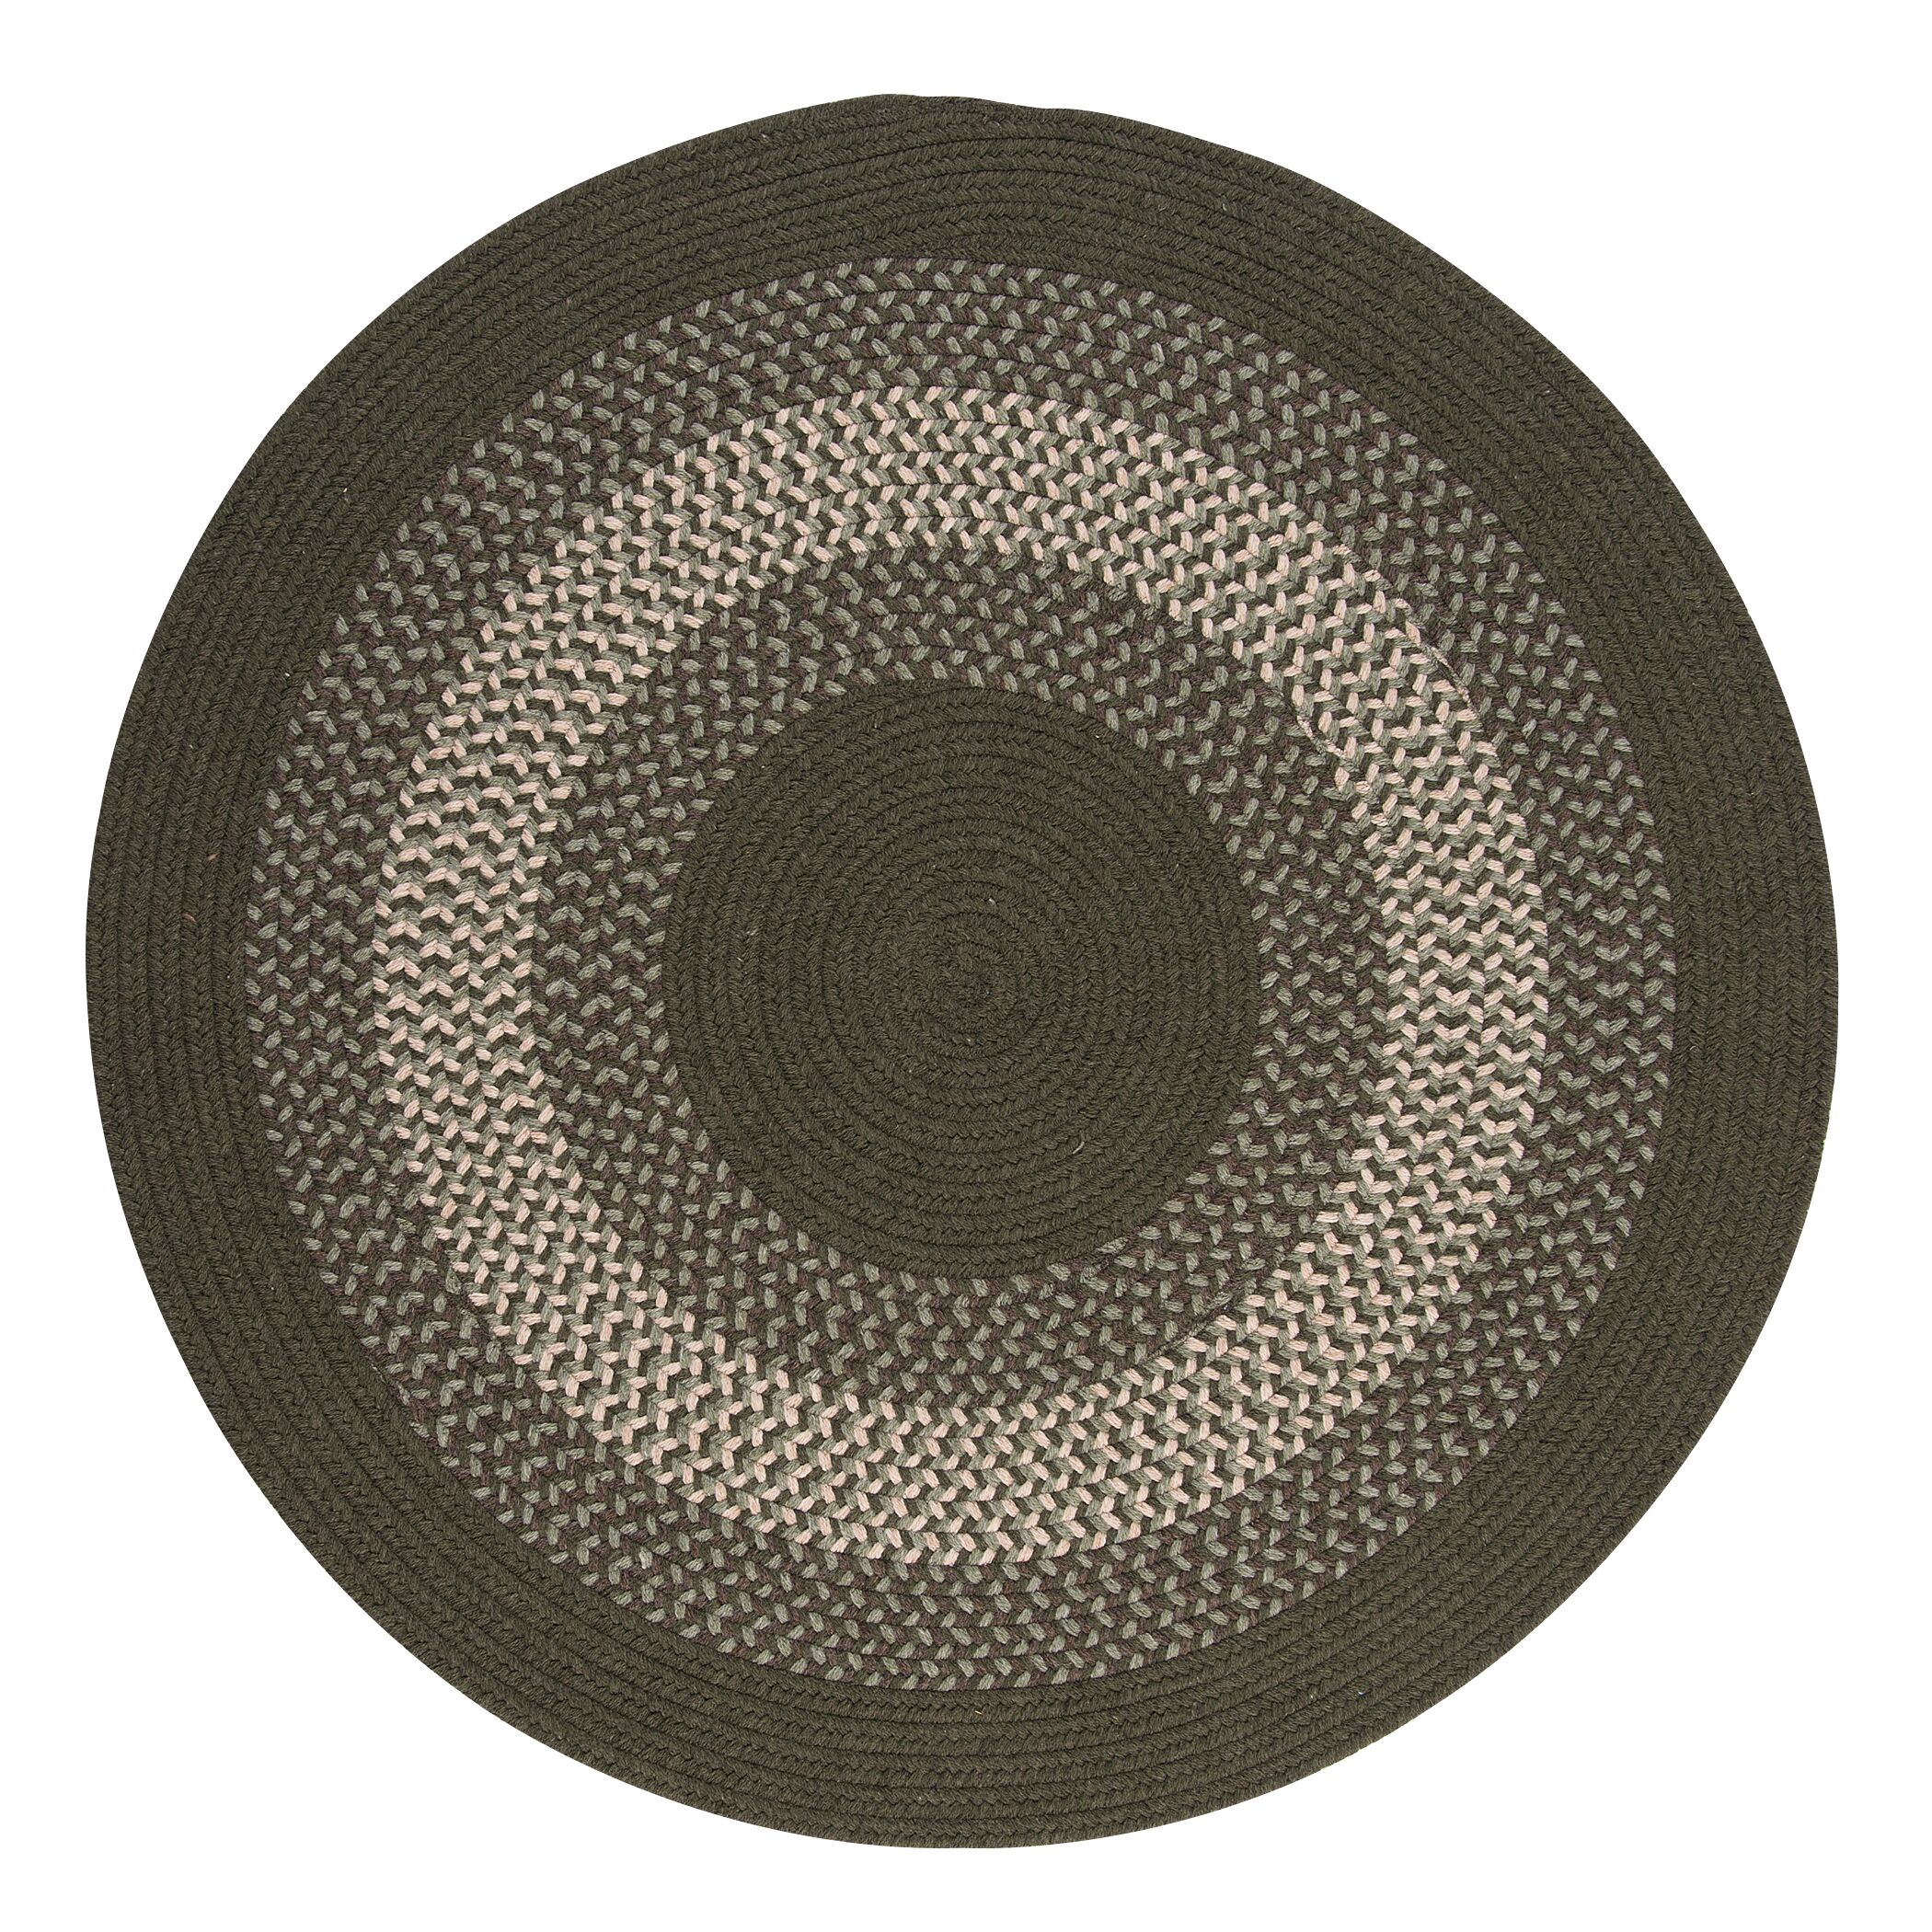 Serafin Olive Area Rug Rug Size: Round 6'